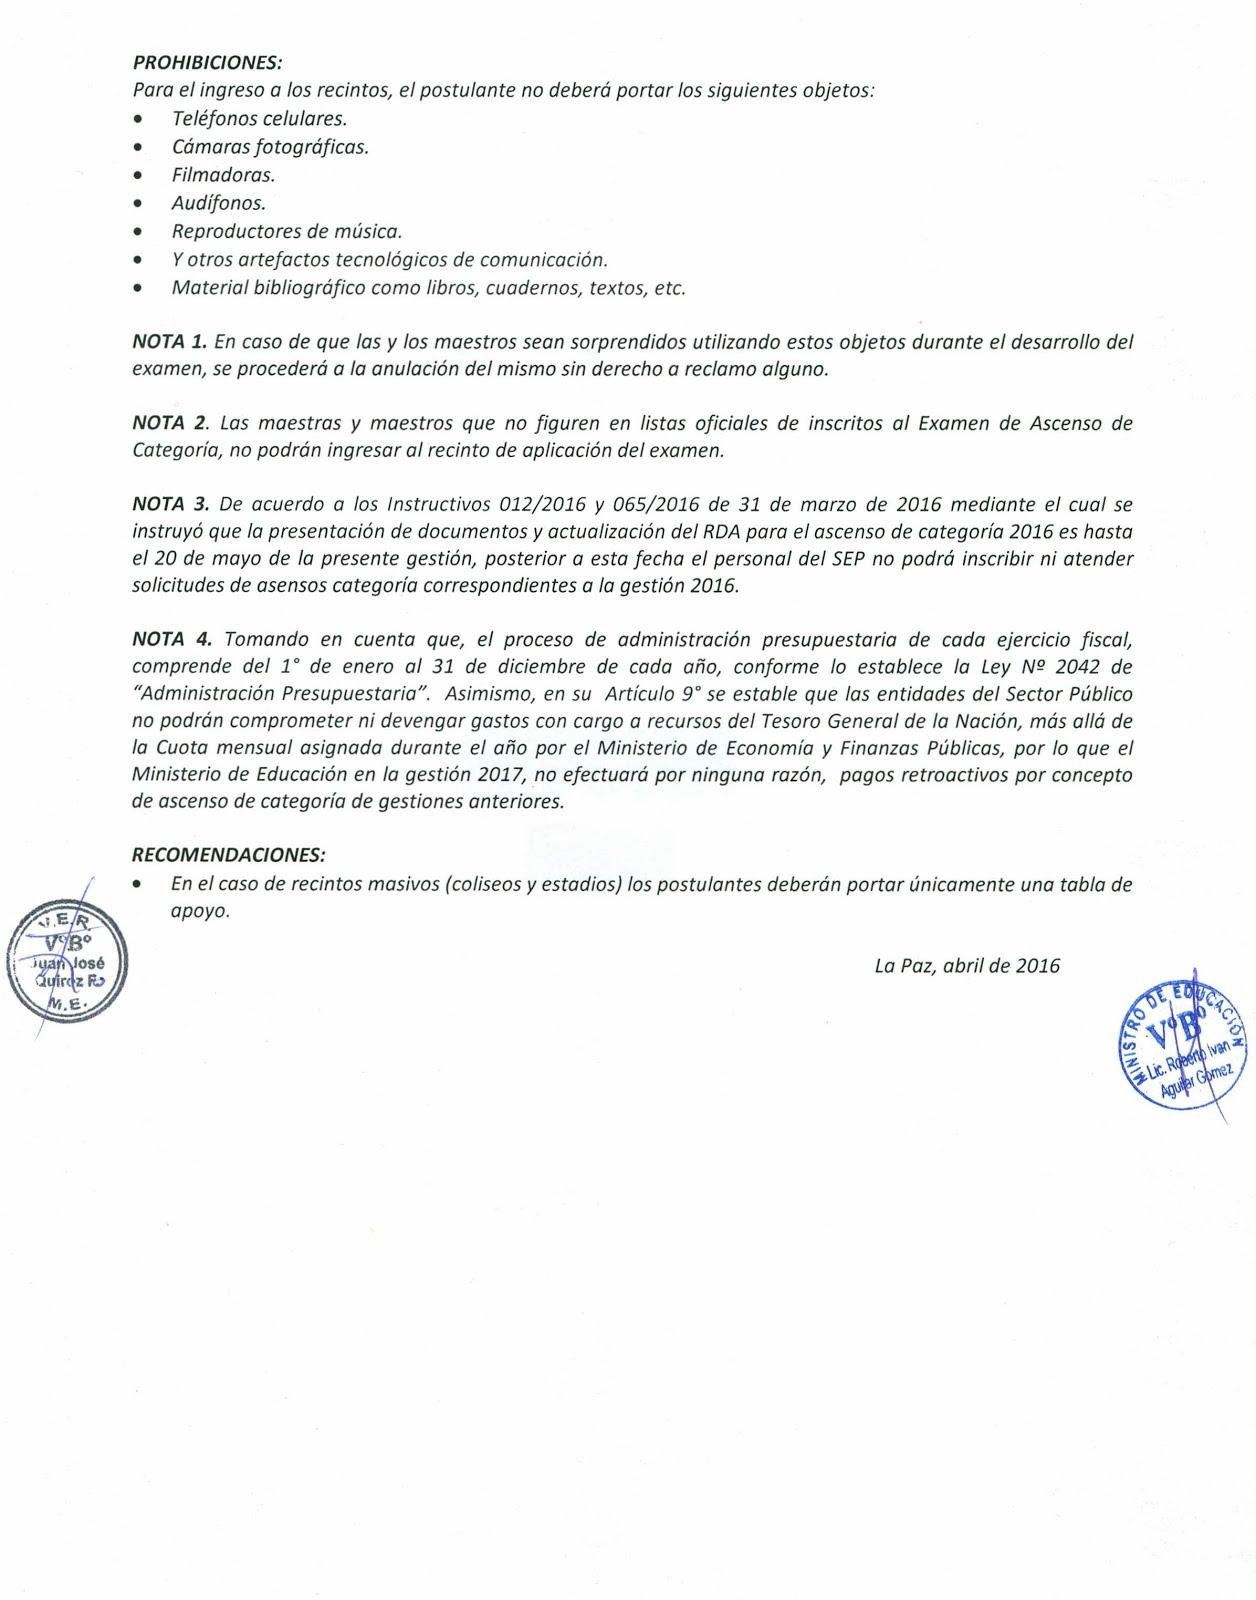 Solo profes de primaria bolivia convocatoria ascenso de for Convocatoria docentes 2016 ministerio de educacion